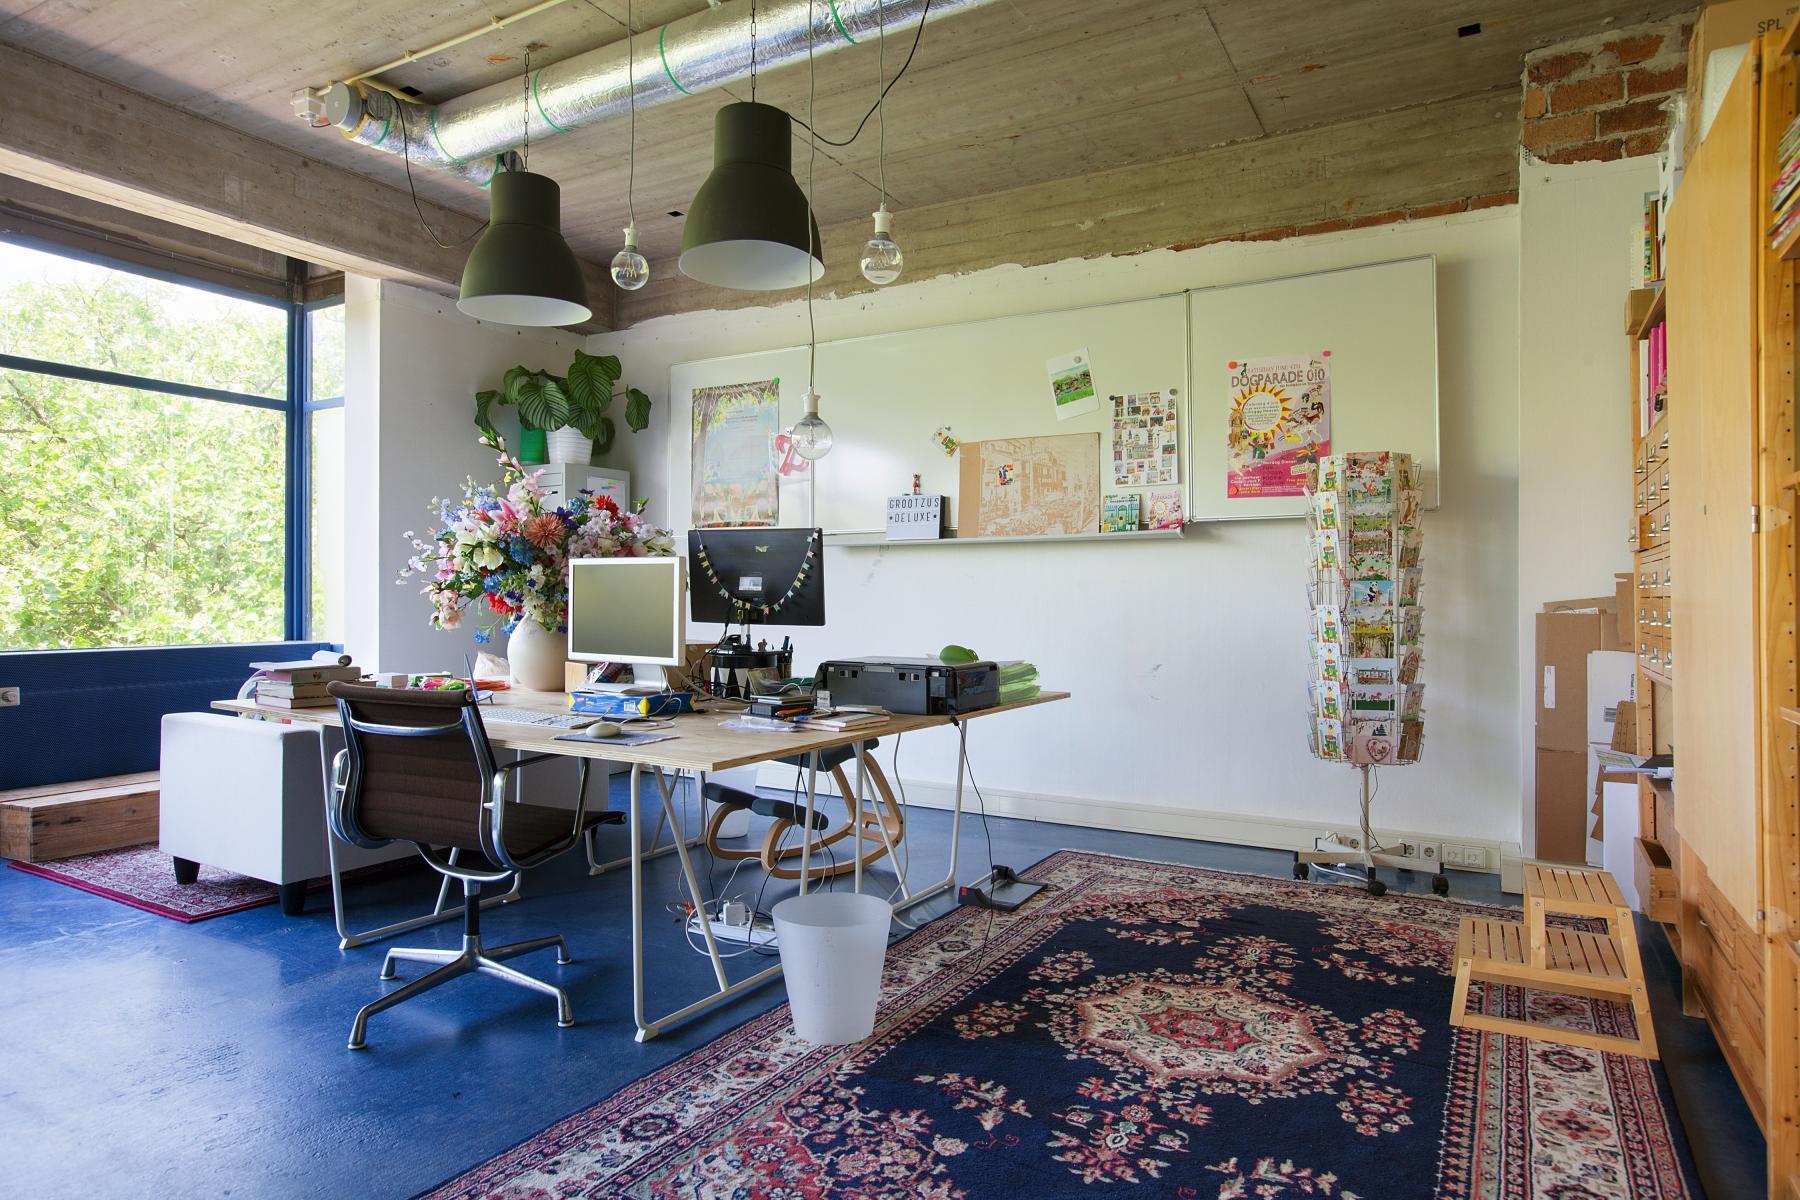 kantoorkamer huren in centum rotterdam met airconditioning